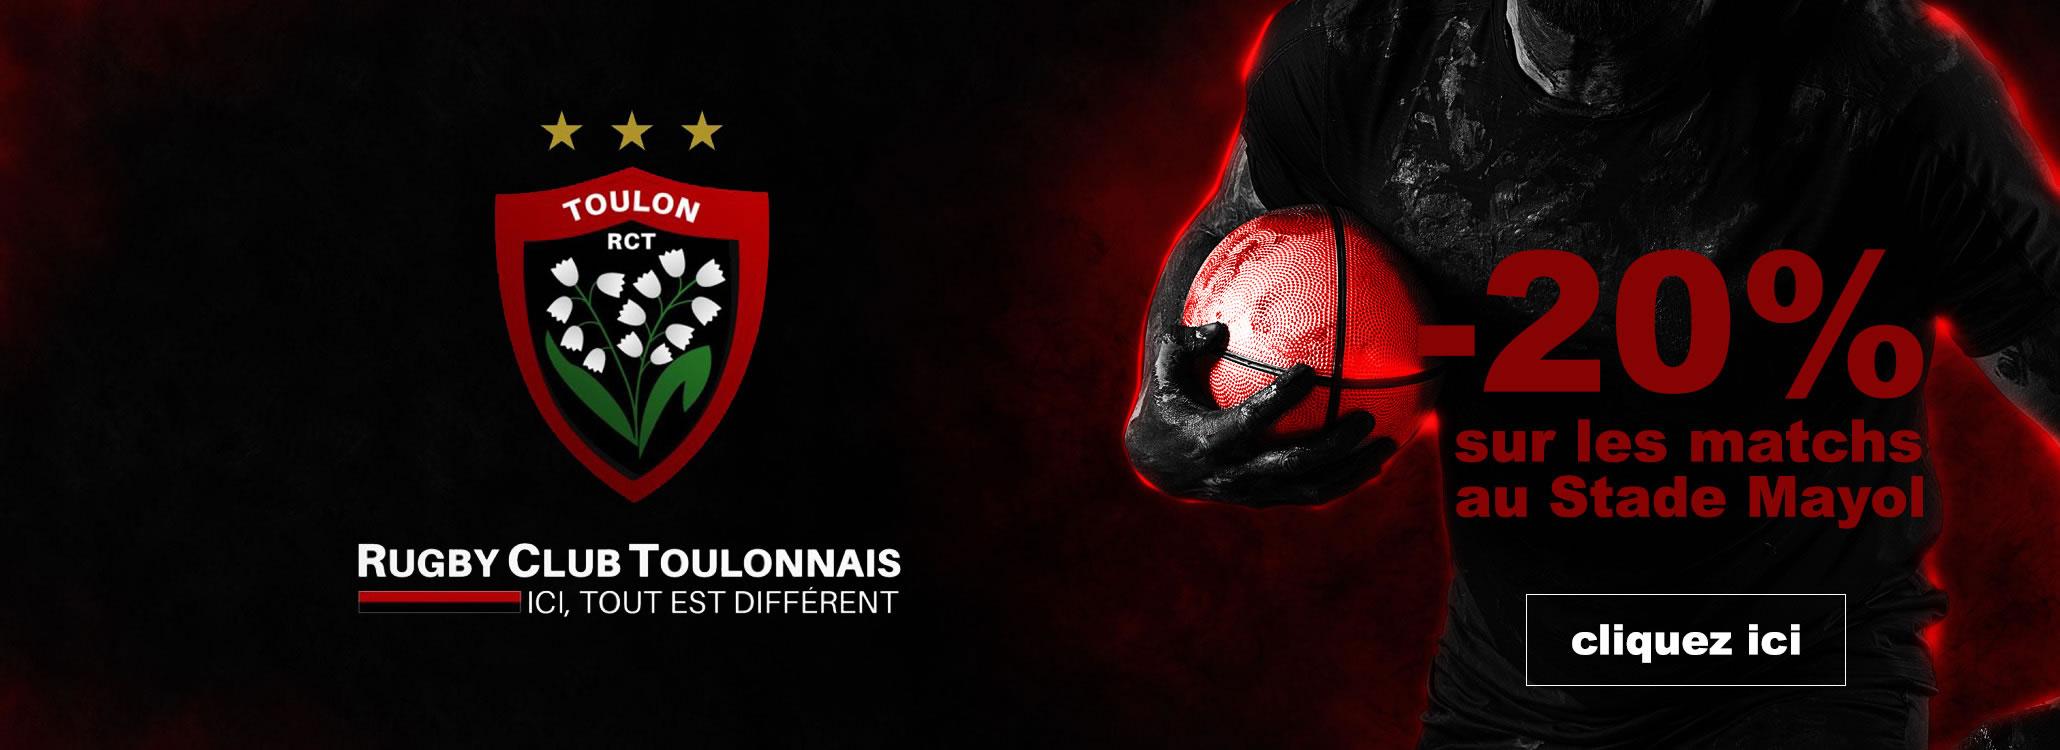 RCT-saison21-22